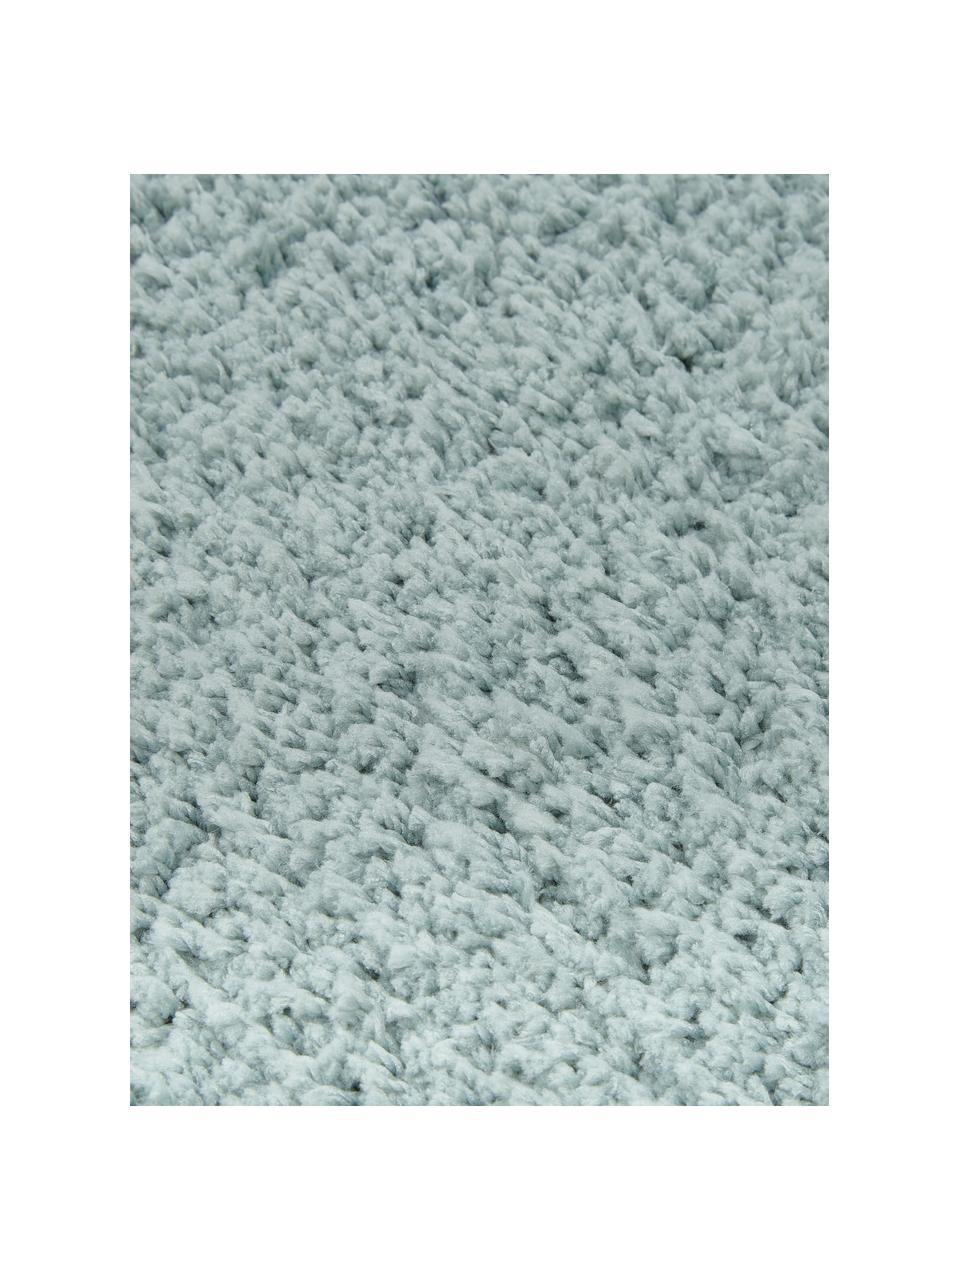 Flauschiger Hochflor-Teppich Leighton in Mintgrün, Flor: Mikrofaser (100% Polyeste, Mintgrün, B 200 x L 300 cm (Größe L)